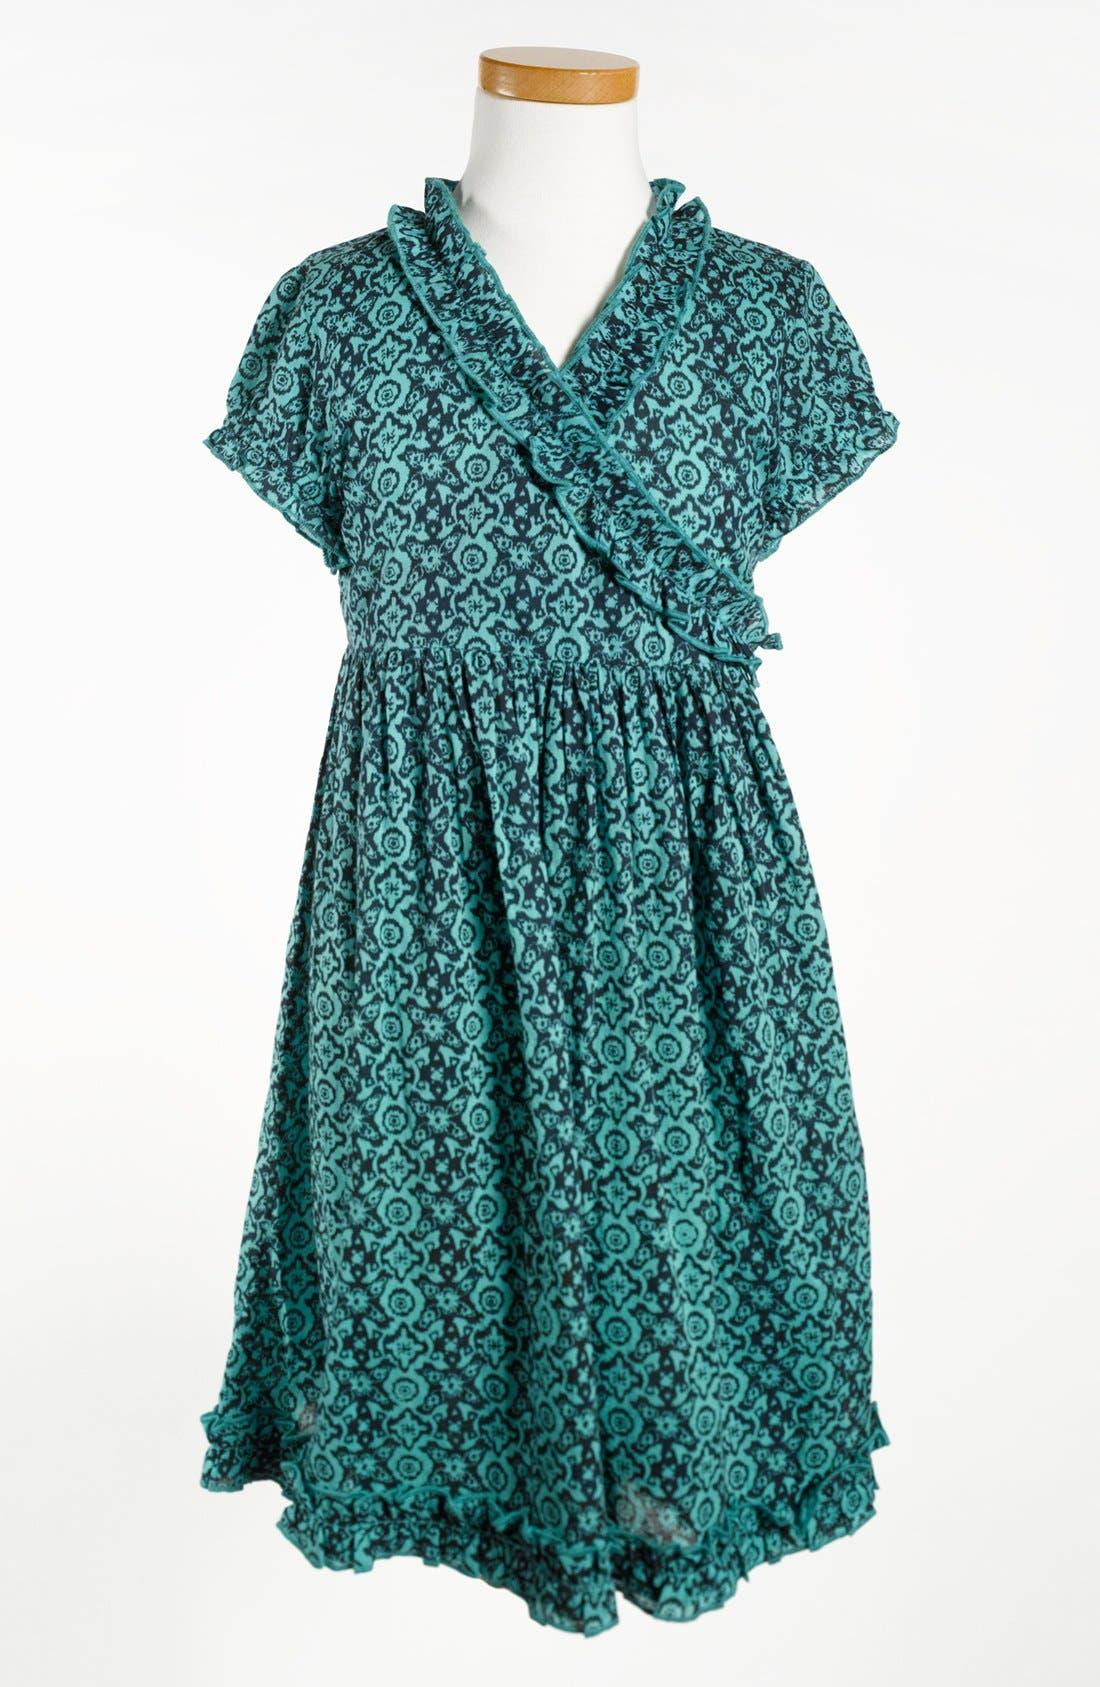 Alternate Image 1 Selected - Peek 'Cristina' Wrap Dress (Toddler Girls, Little Girls & Big Girls)